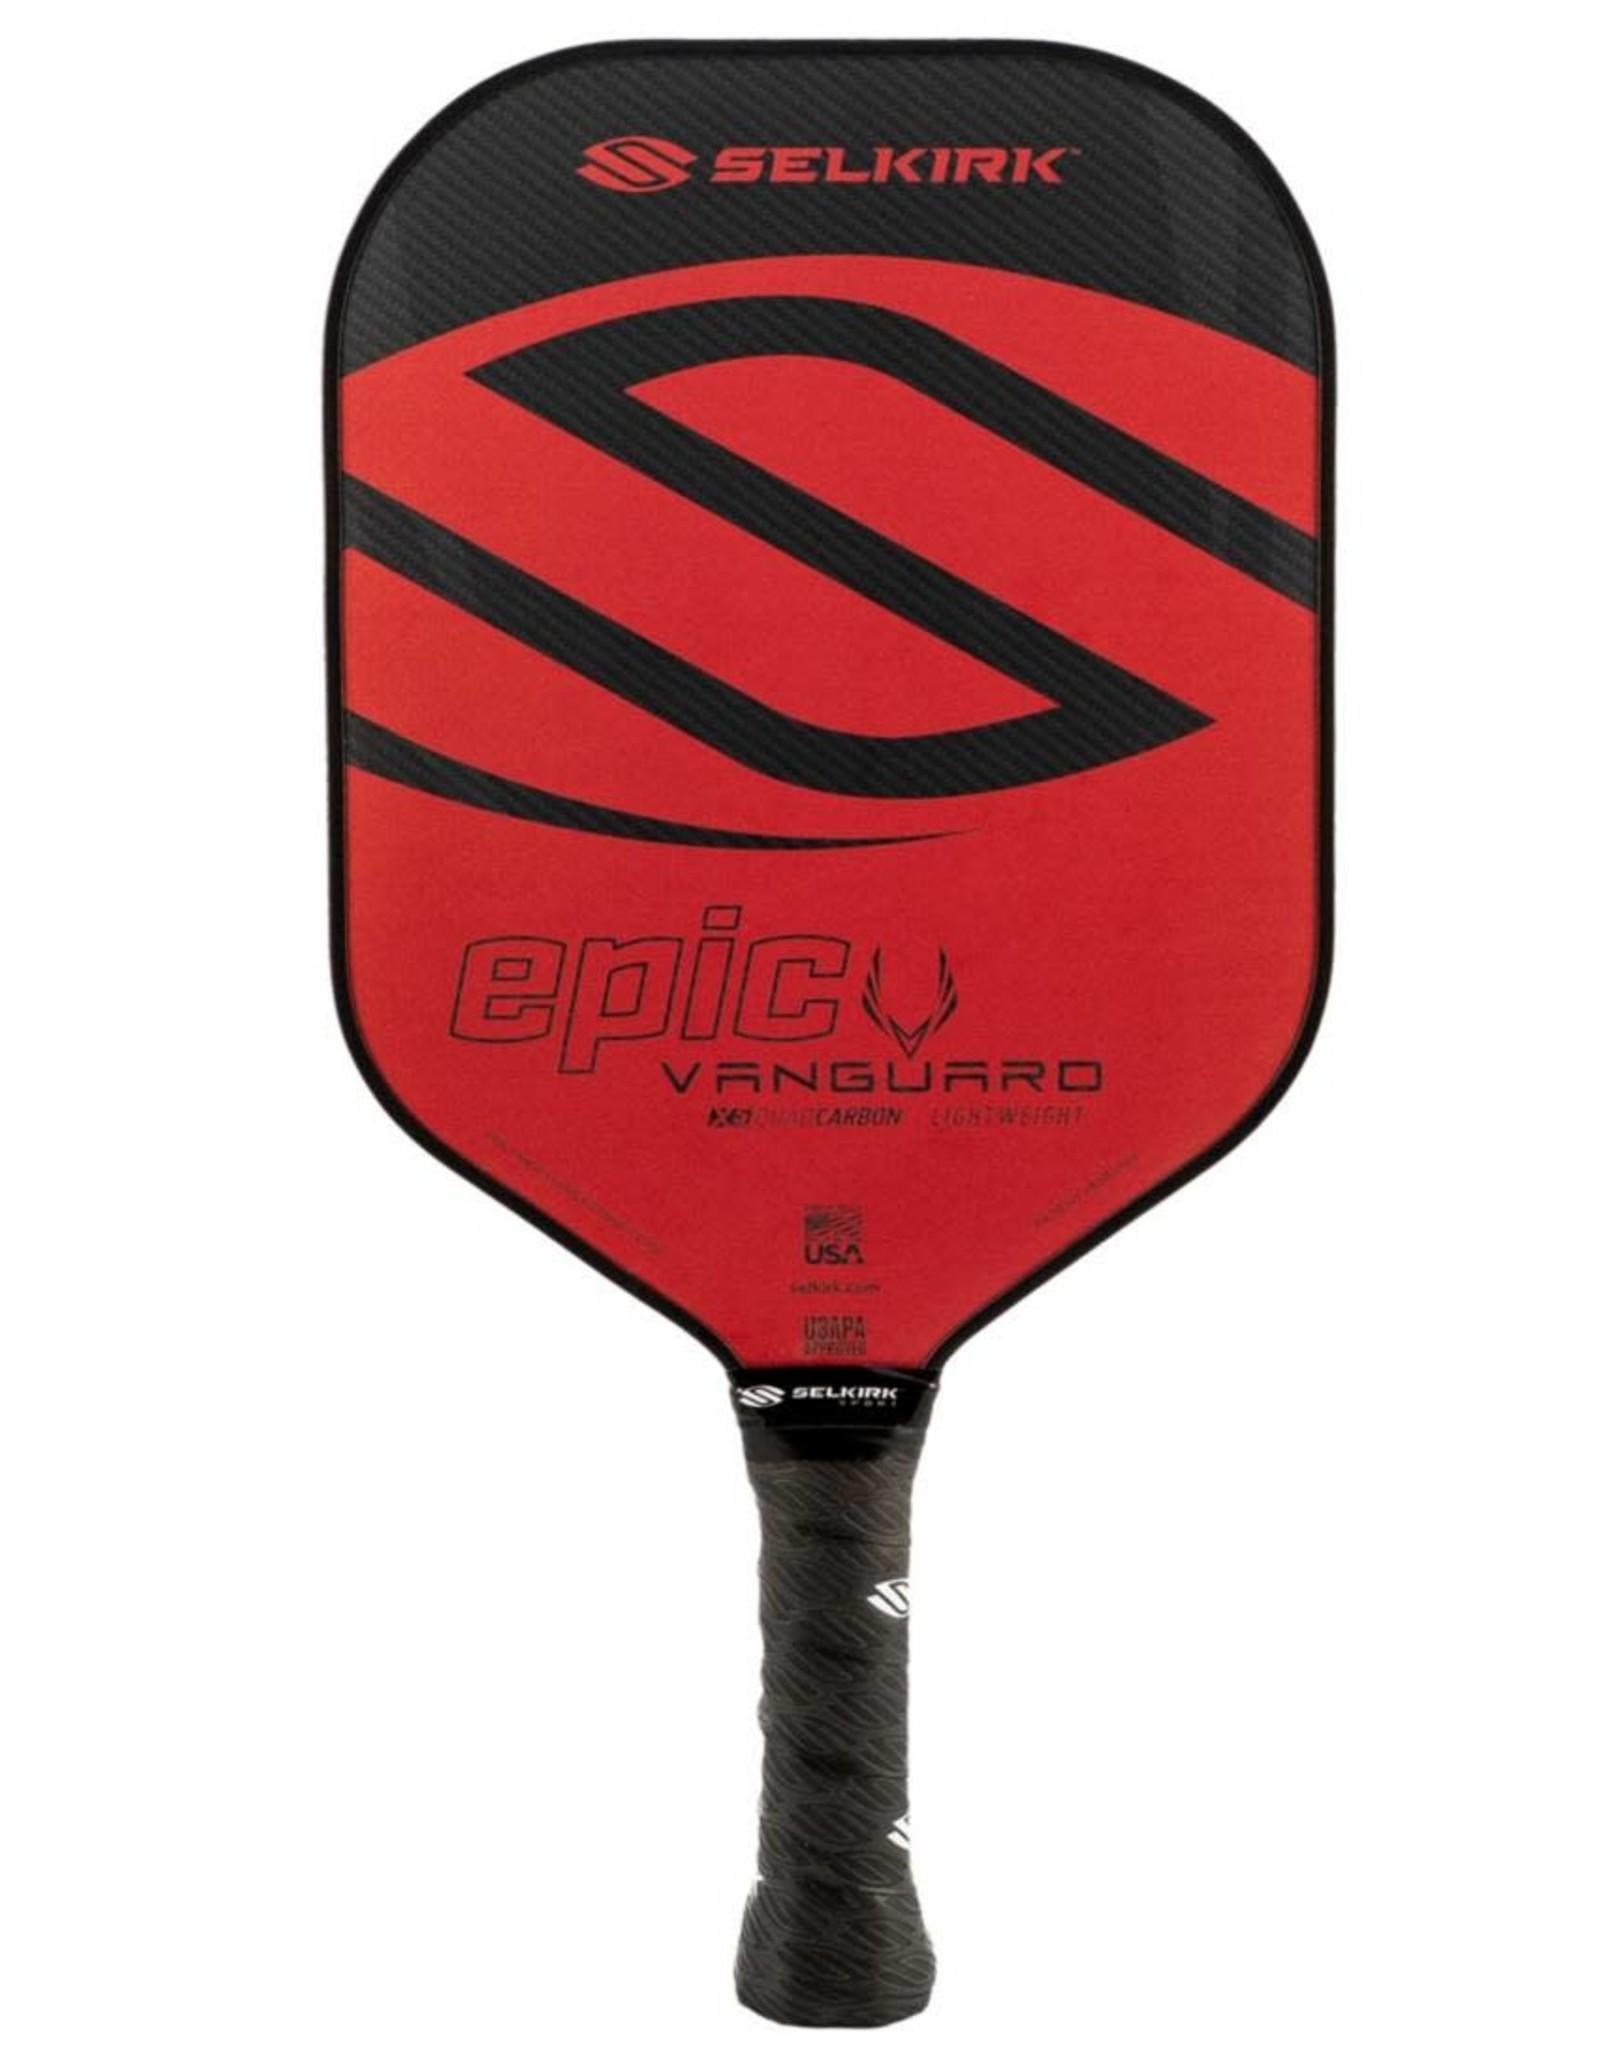 Selkirk Selkirk Vanguard Hybrid Epic Lightweight Crimson Black Pickleball Paddle